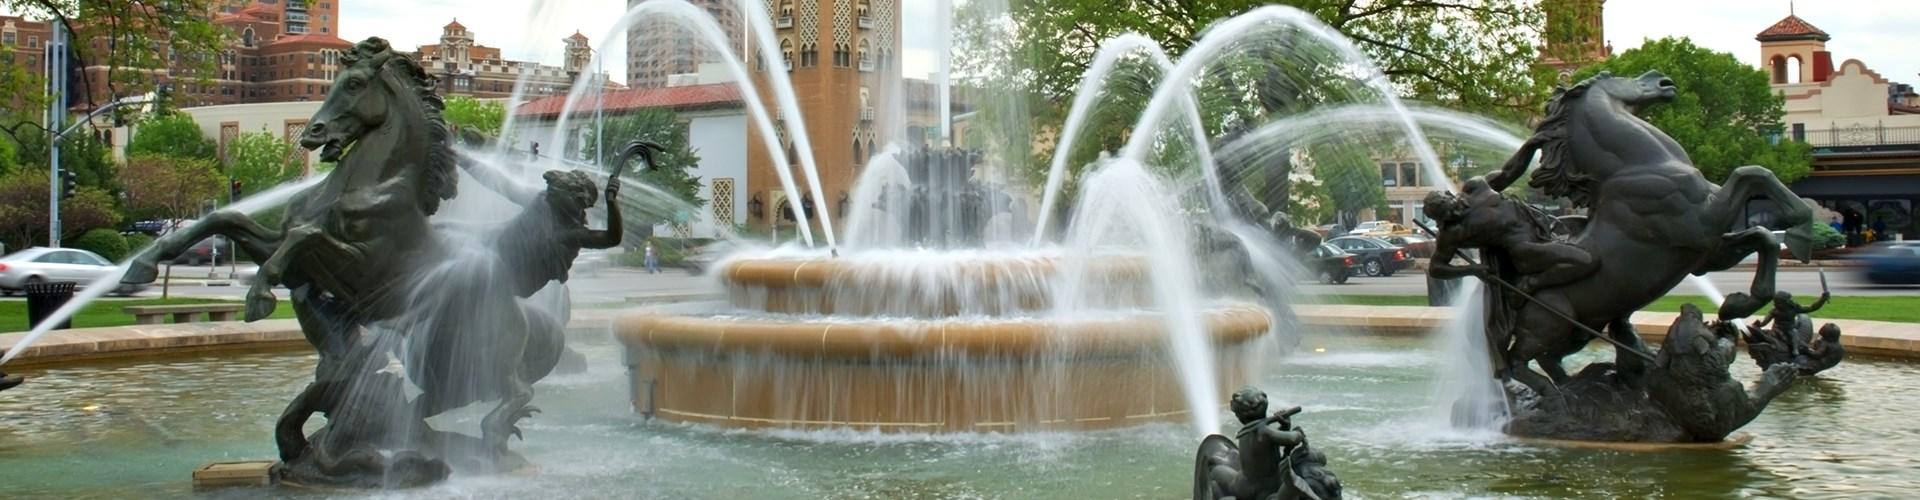 J.C. Nichols Memorial Fountain, Kansas City, Missouri